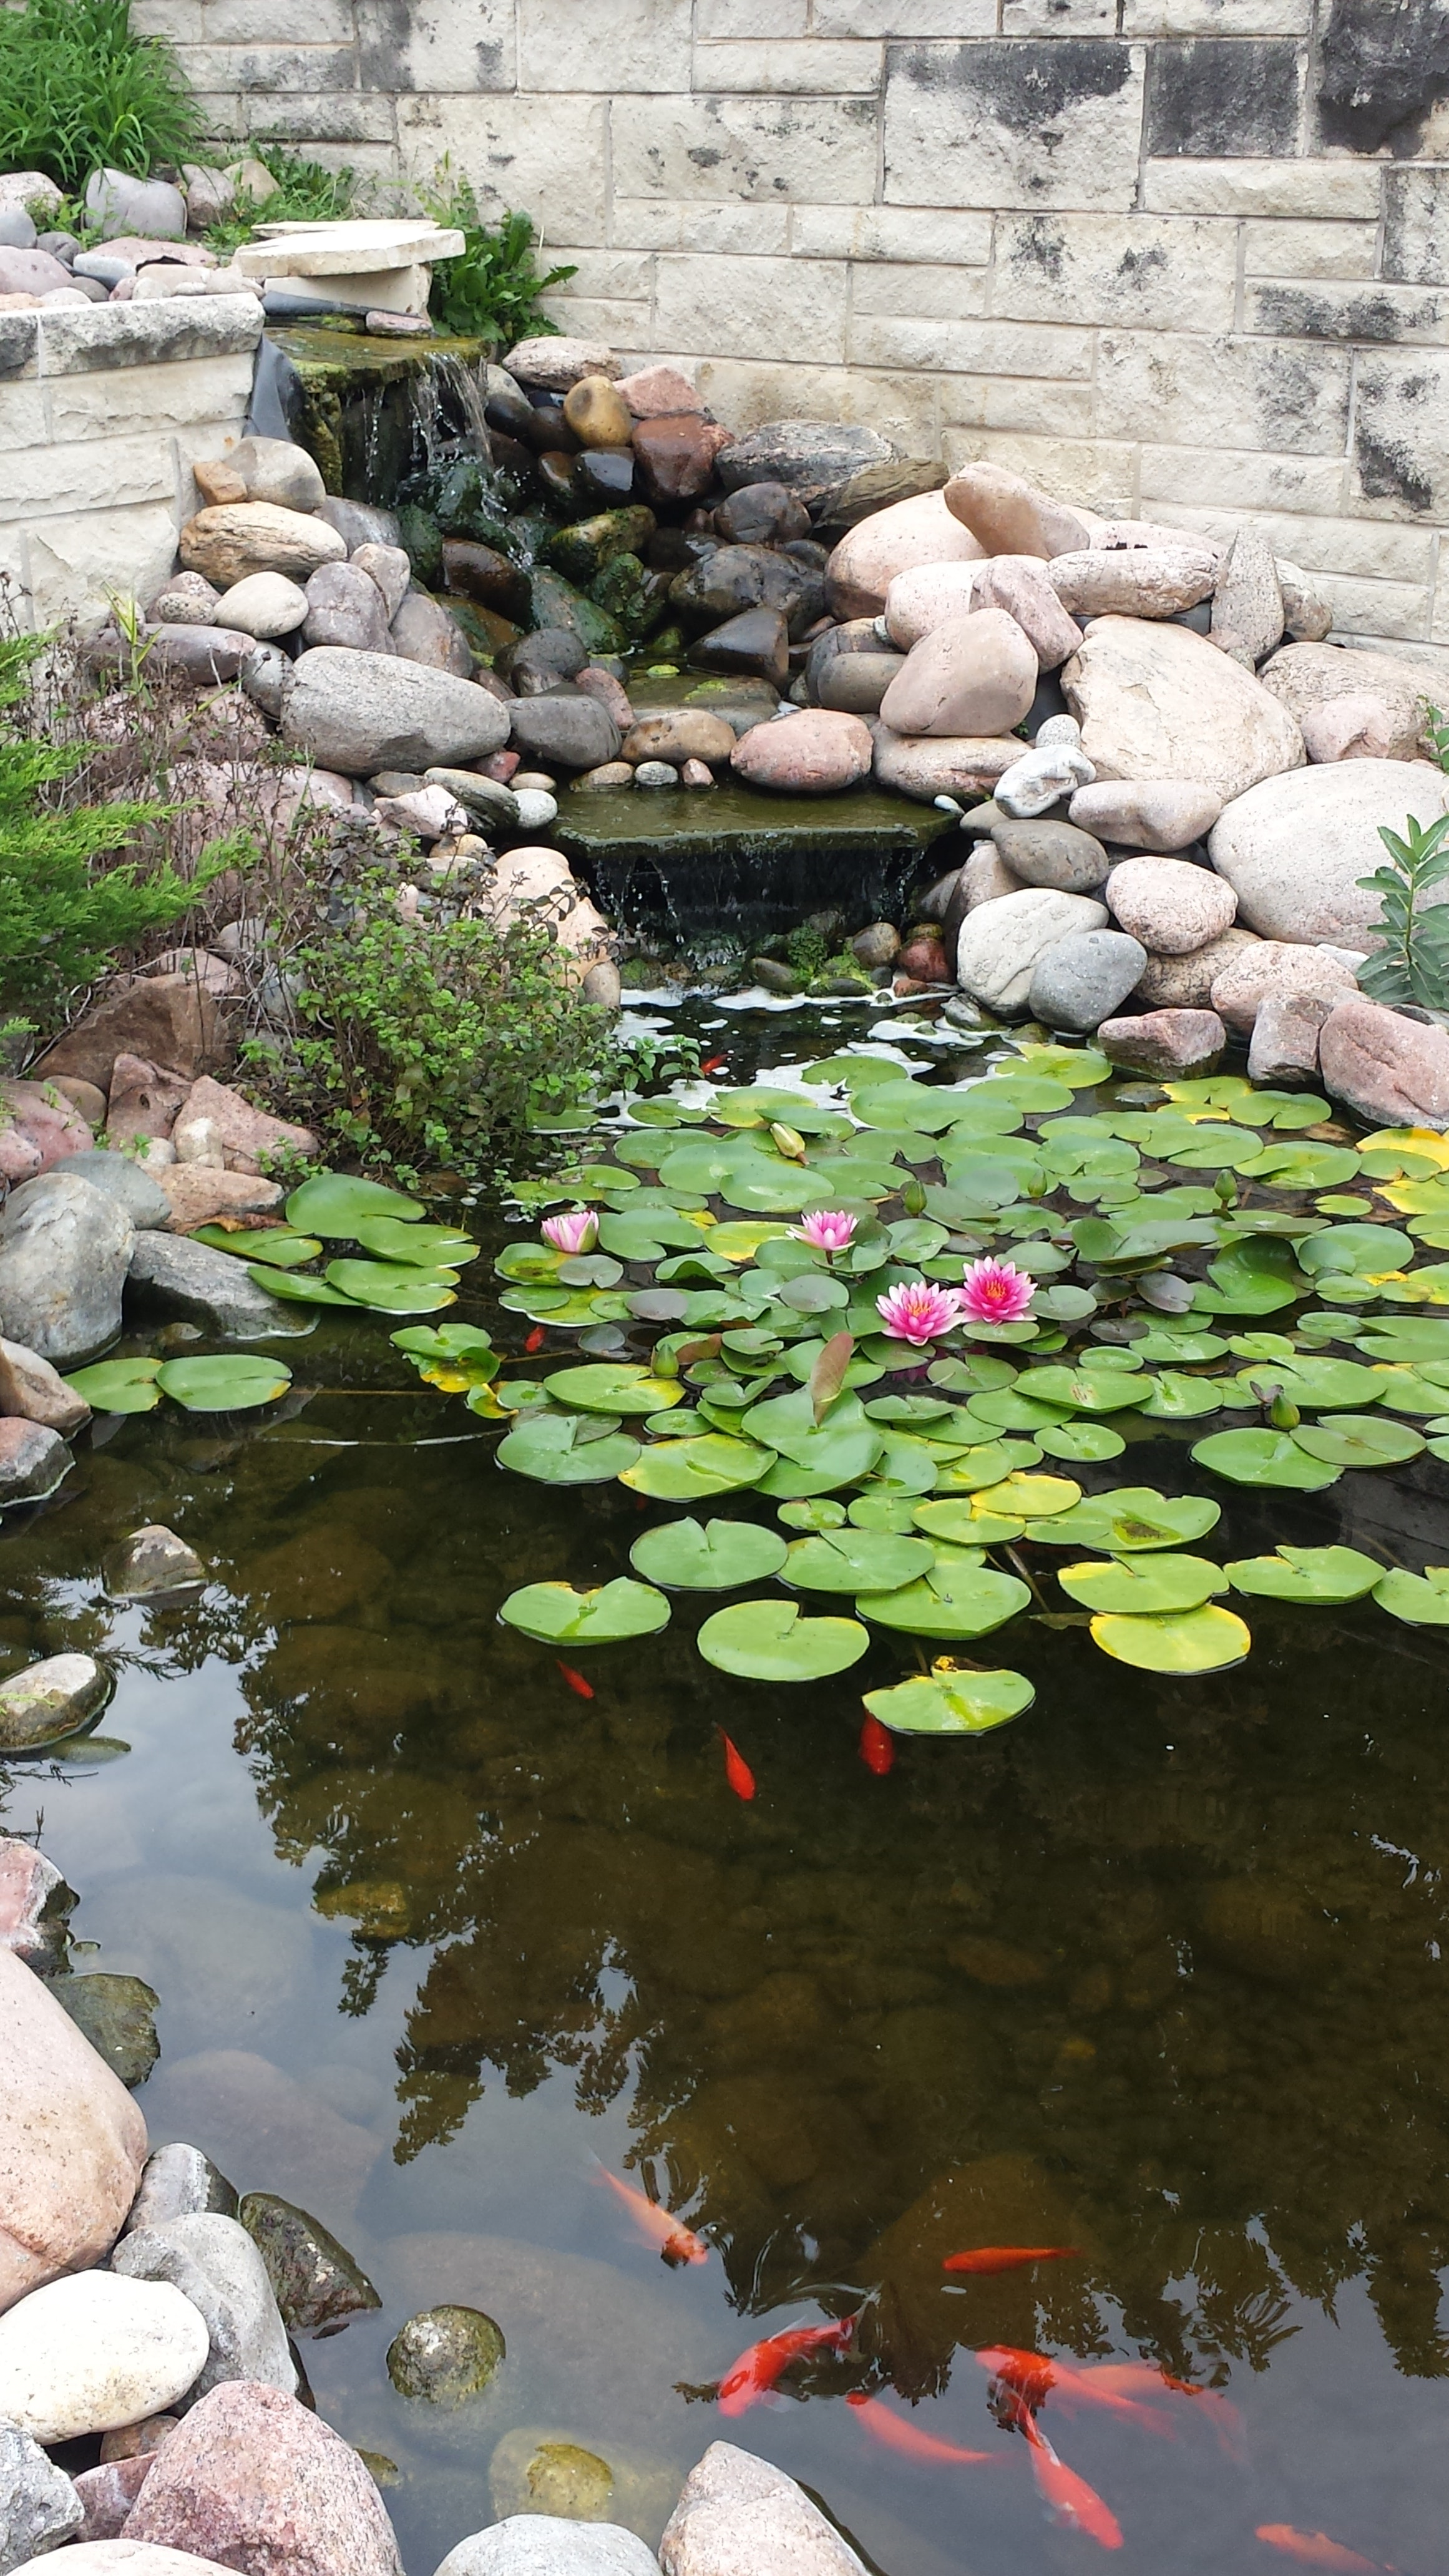 calm-waters-fishes-garden-pond-775986.jpg